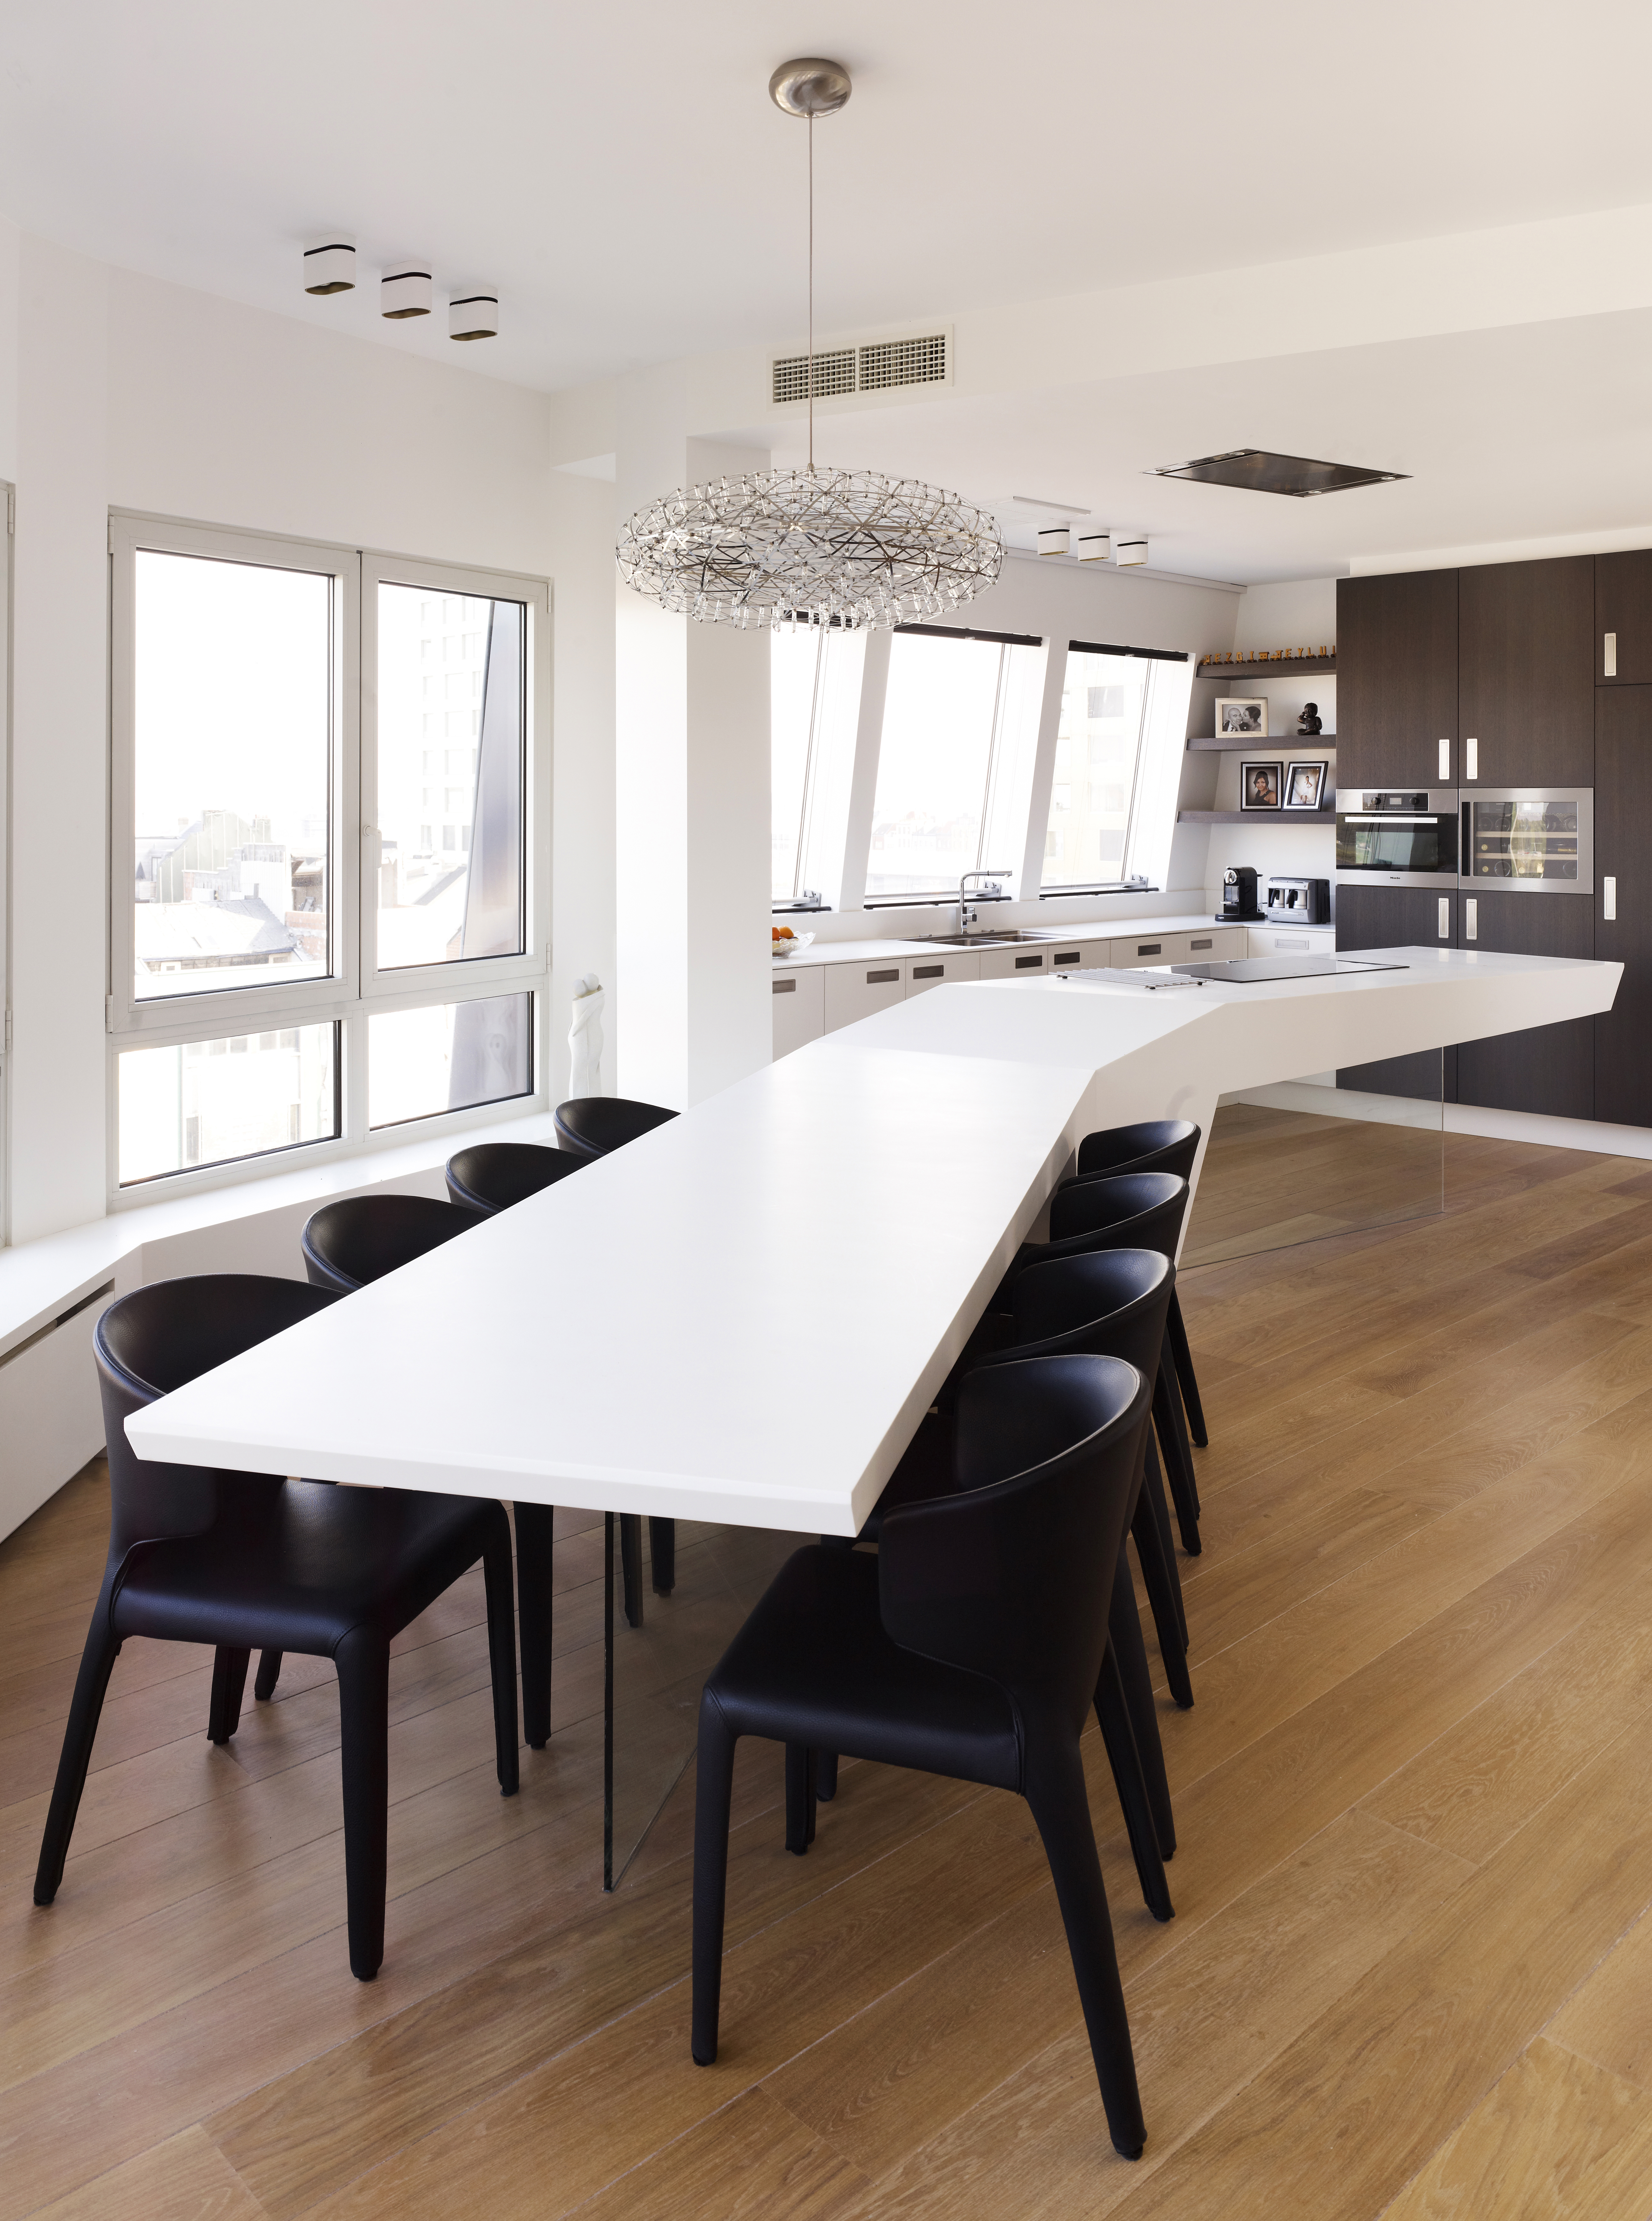 Penthouse in Antwerpen | HI-MACS®